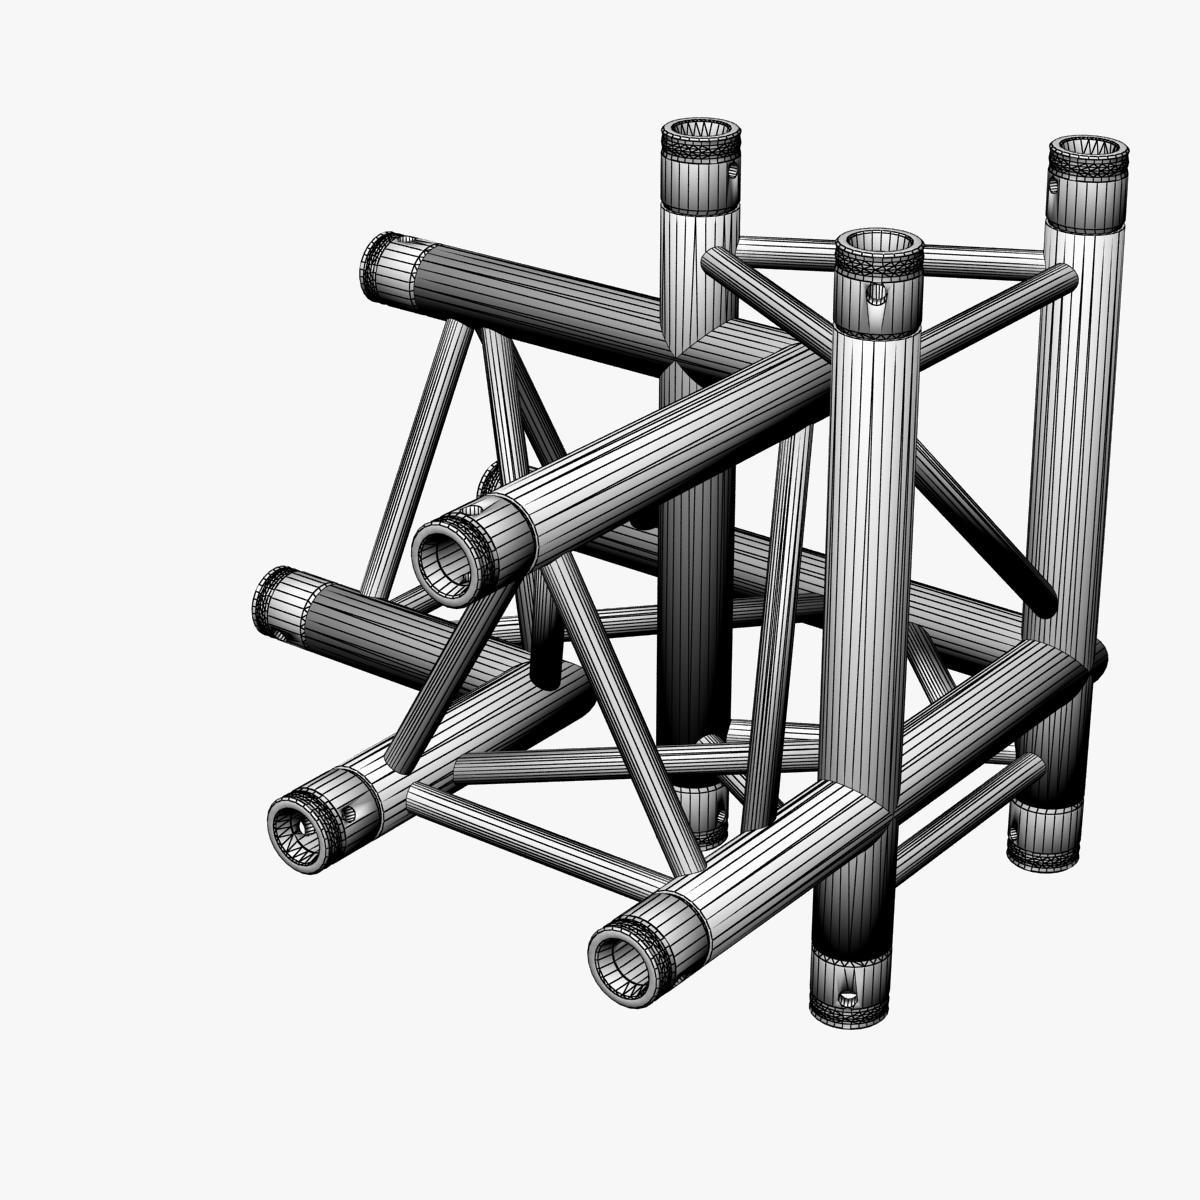 Triangular Truss Corner Junction 102 3d model 3ds max dxf fbx b3d c4d  obj other 268937